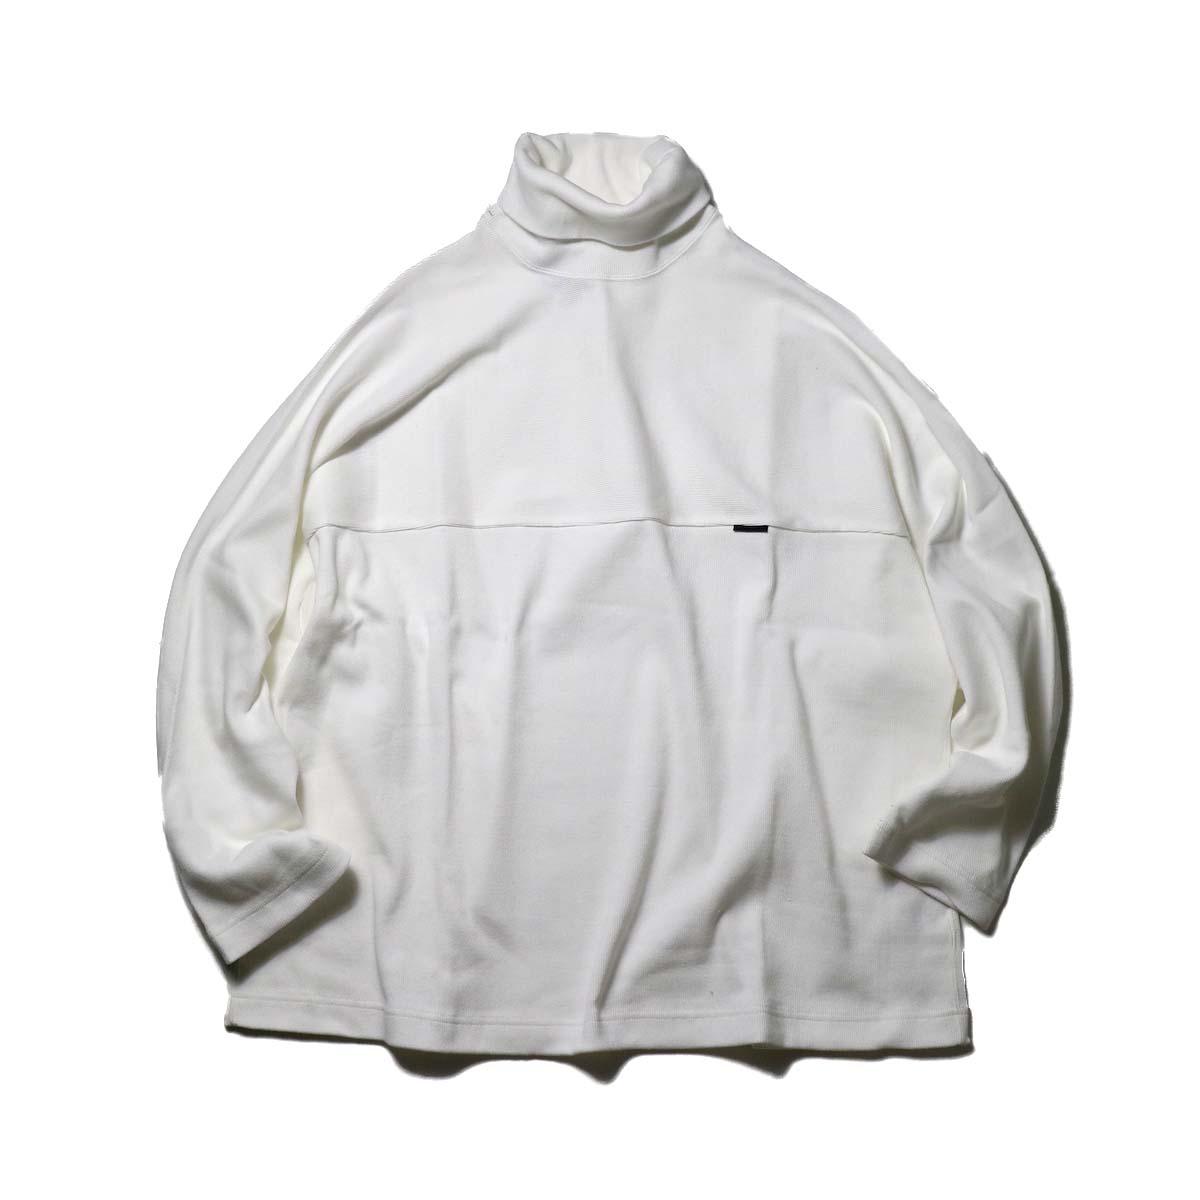 N.HOOLYWOOD / 2202-CS04-021 HIGH NECK T-SHIRT (White)